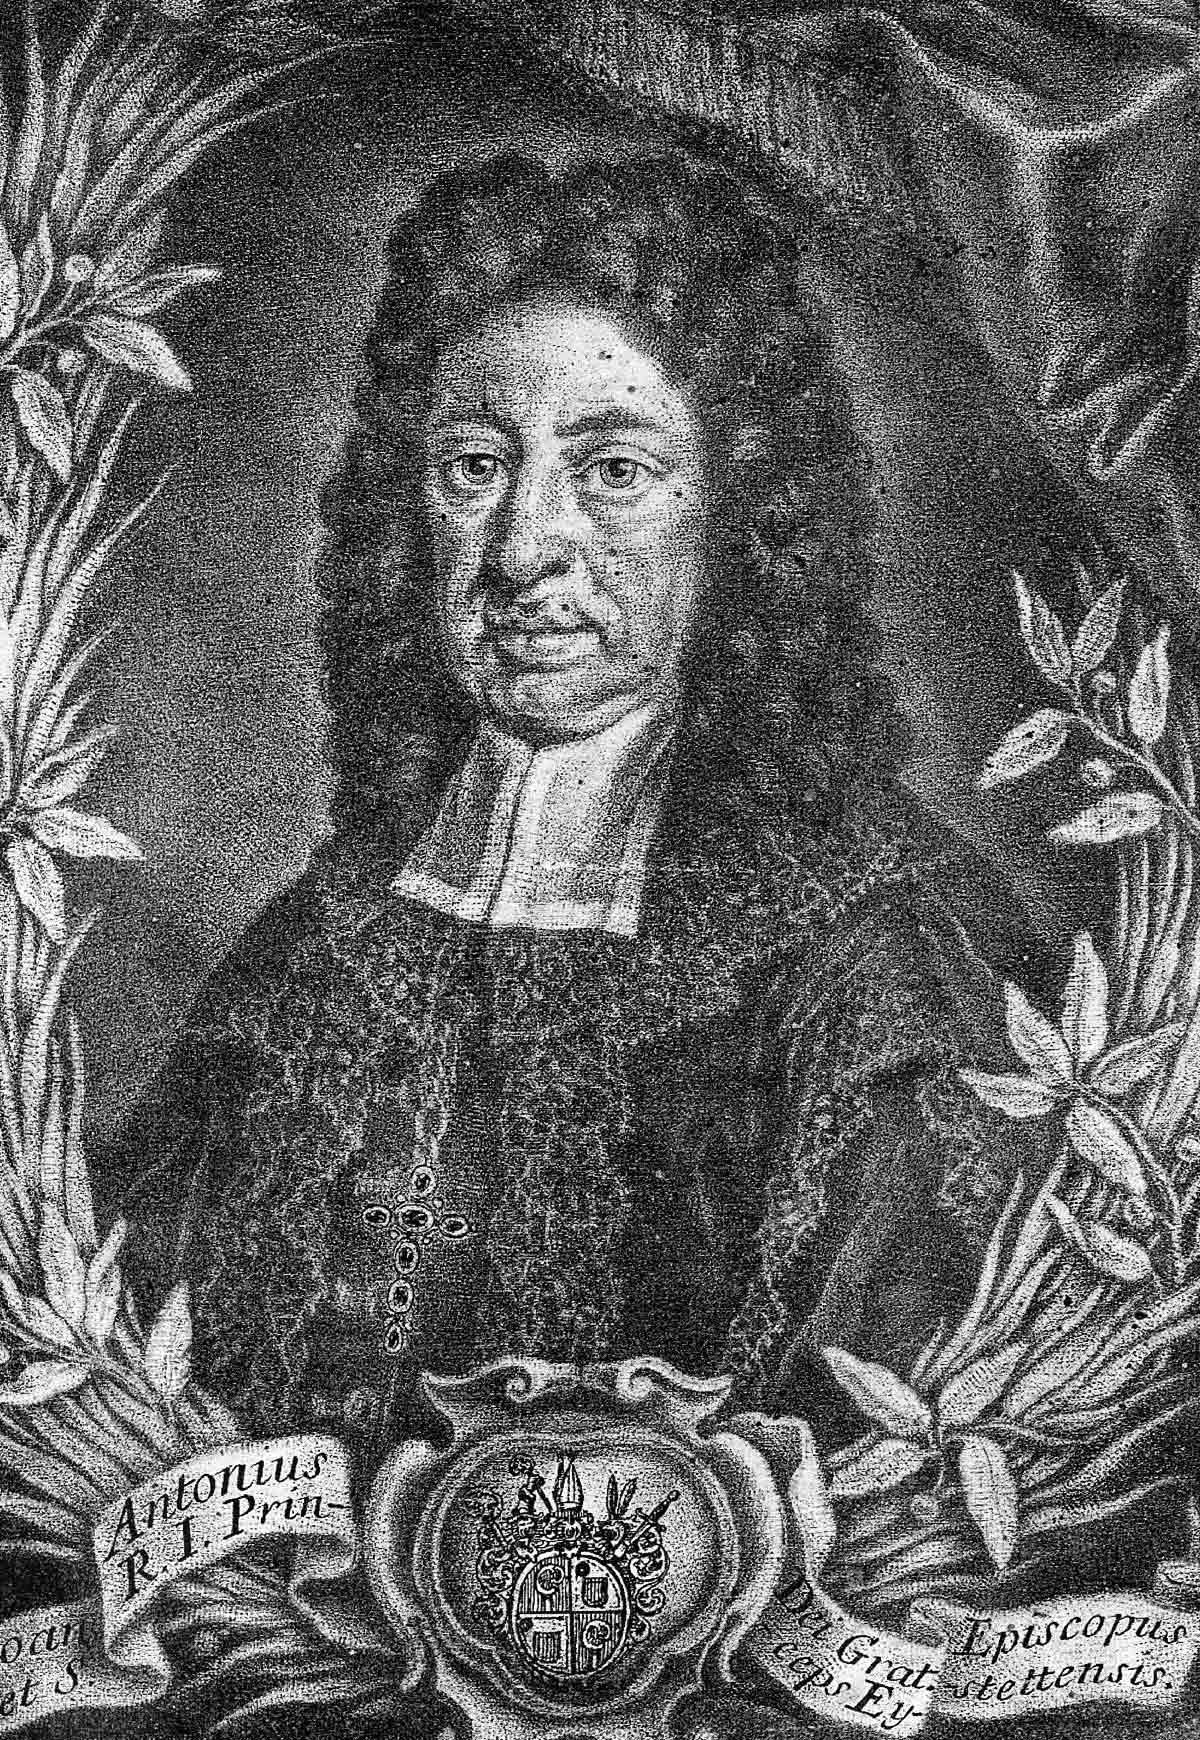 Johann Anton I. Knebel von Katzenellenbogen